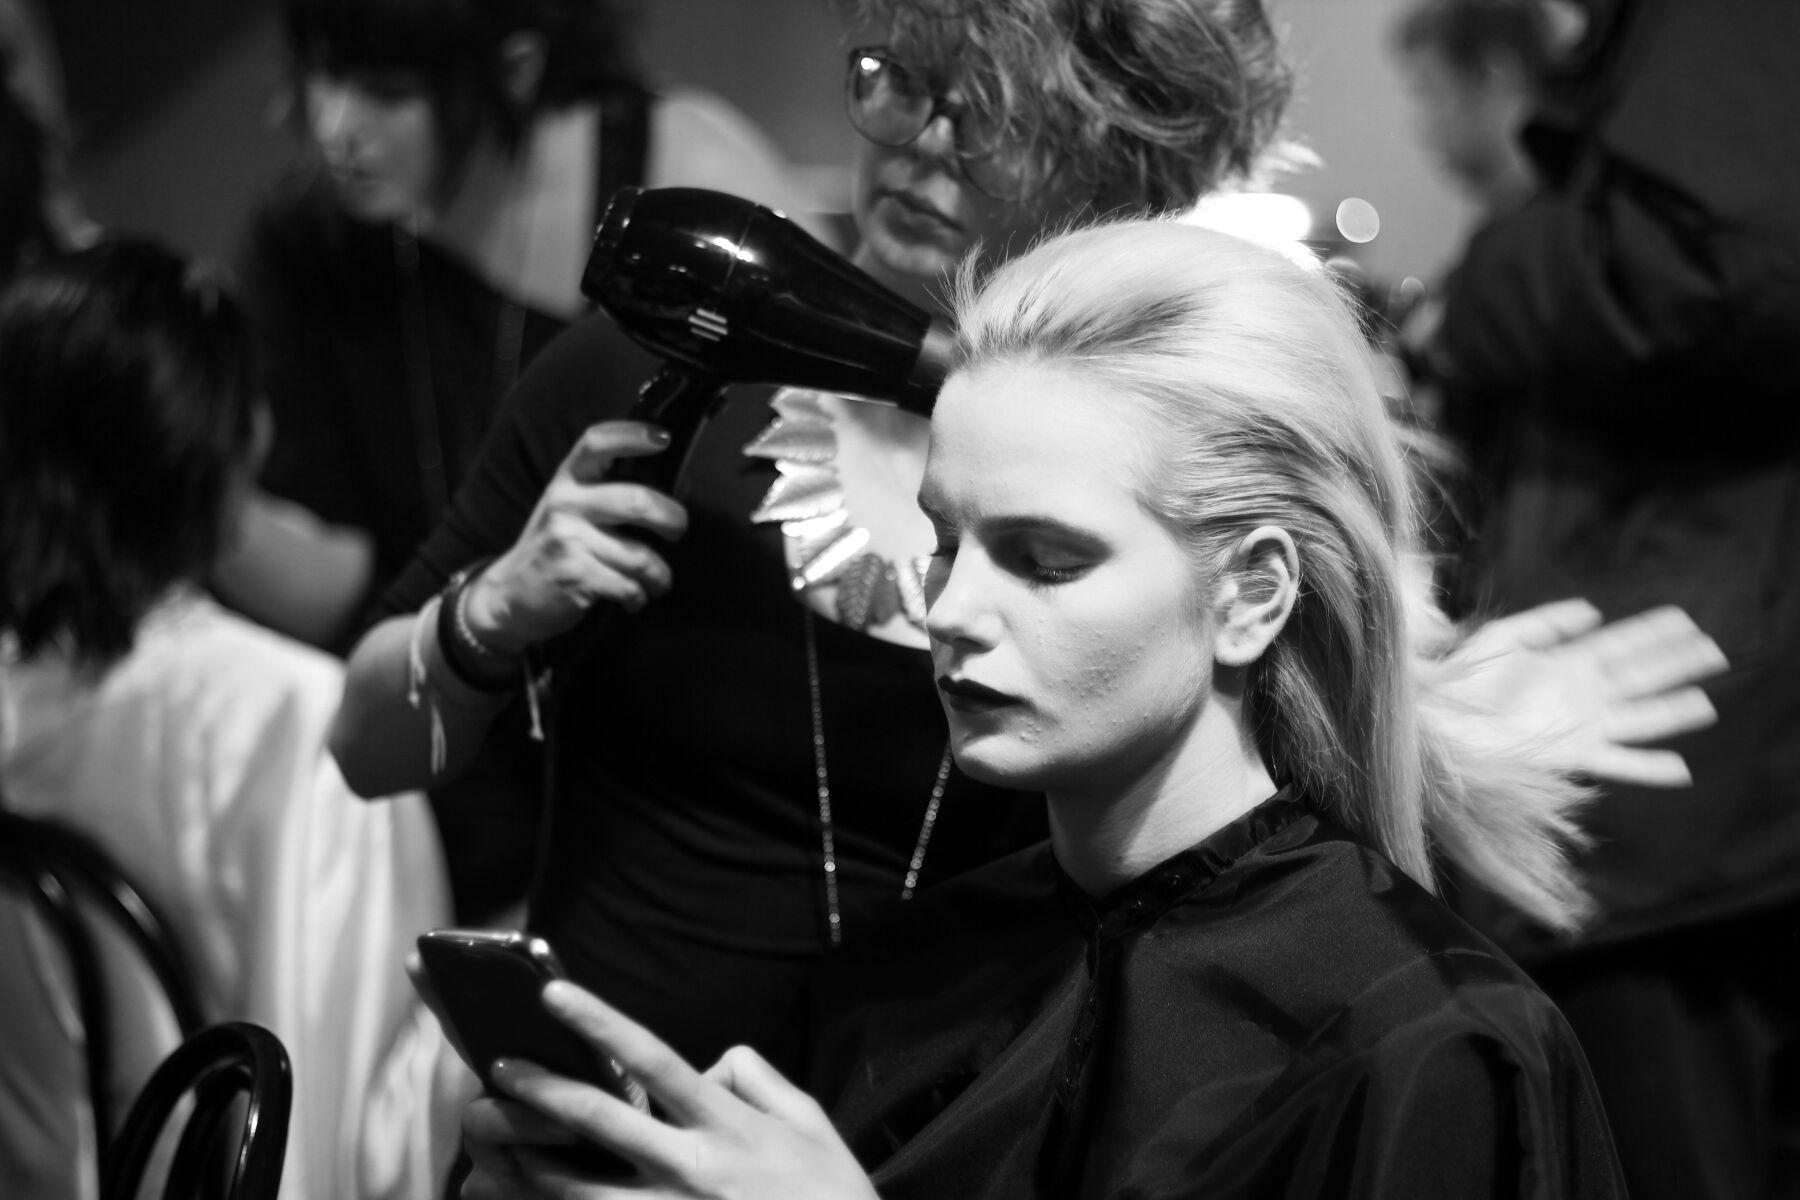 Backstage Anteprima FW 2013 14 Model Hair Style